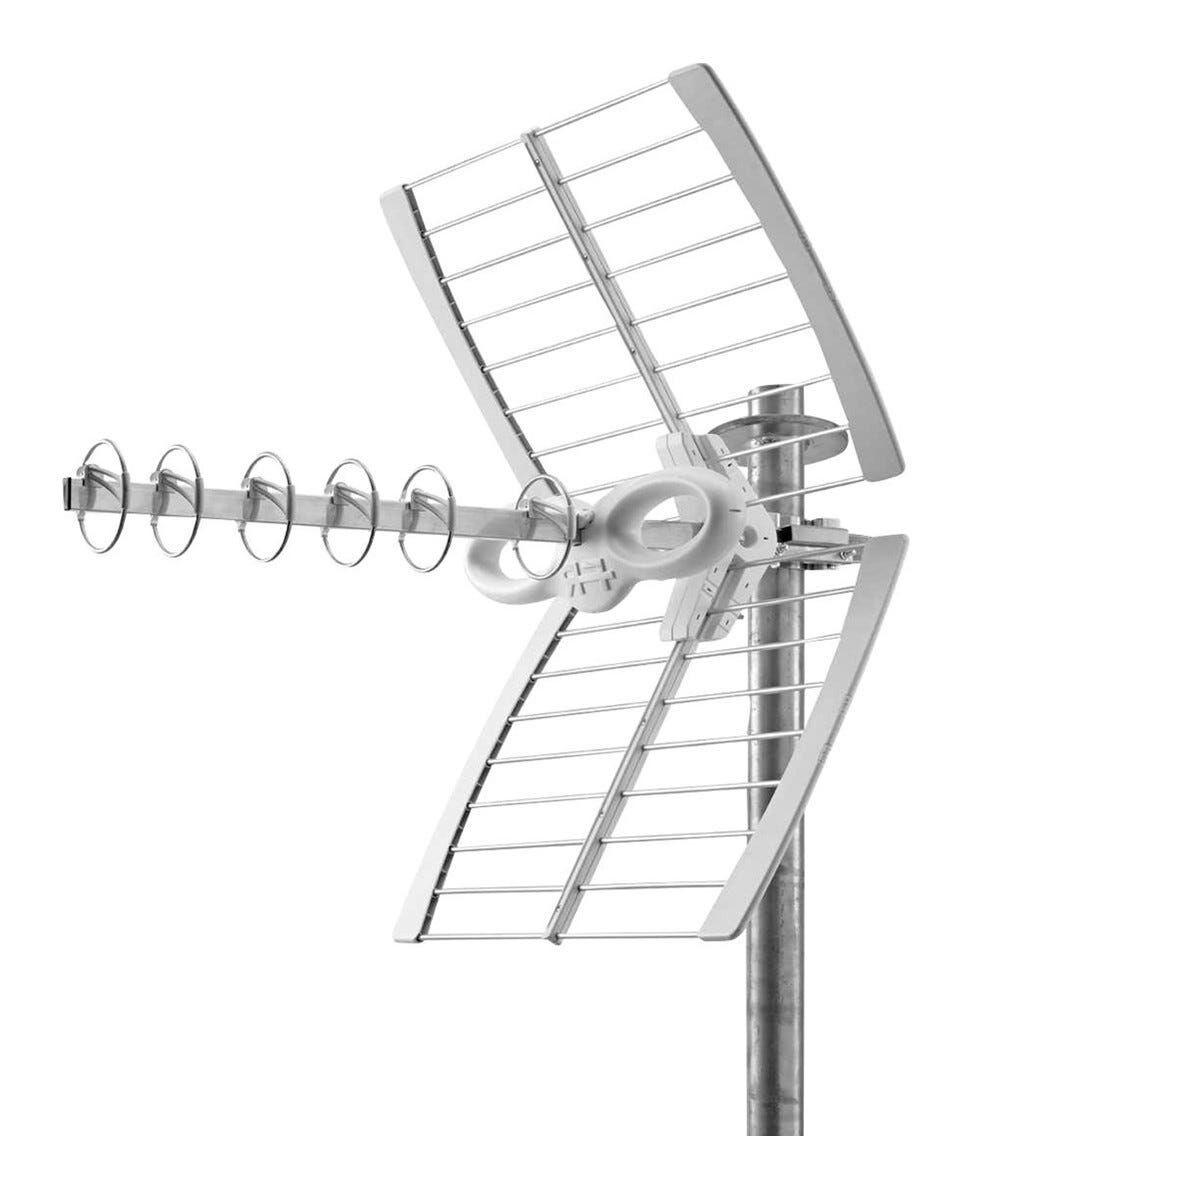 Sigma Antenna Uhf Fracarro Sigma 6hd Larga Banda Per Ricezione Tv-Lte